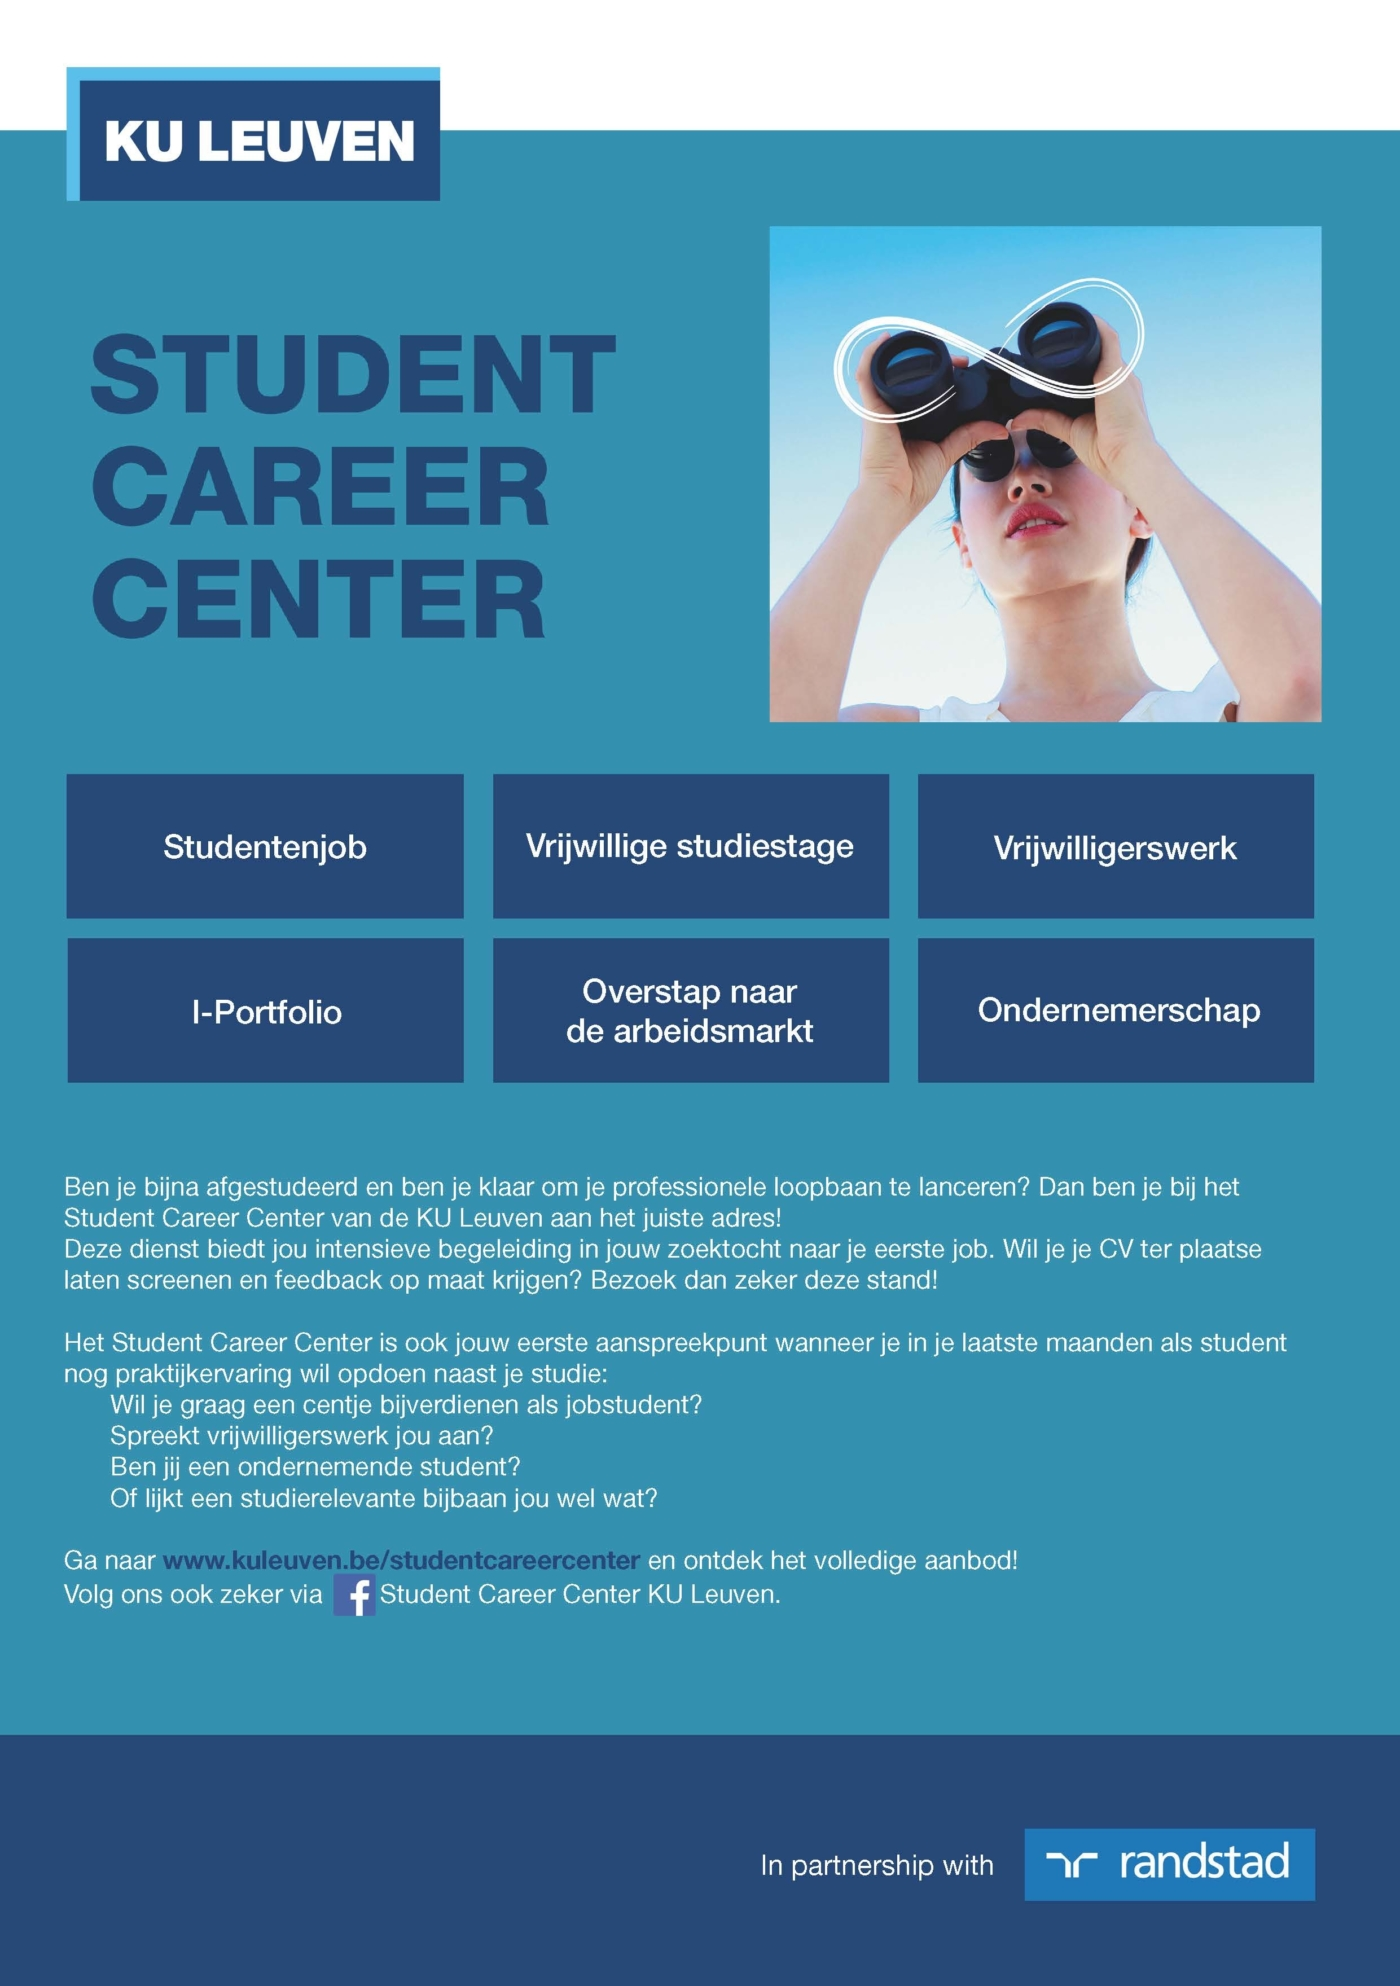 Student Career Center